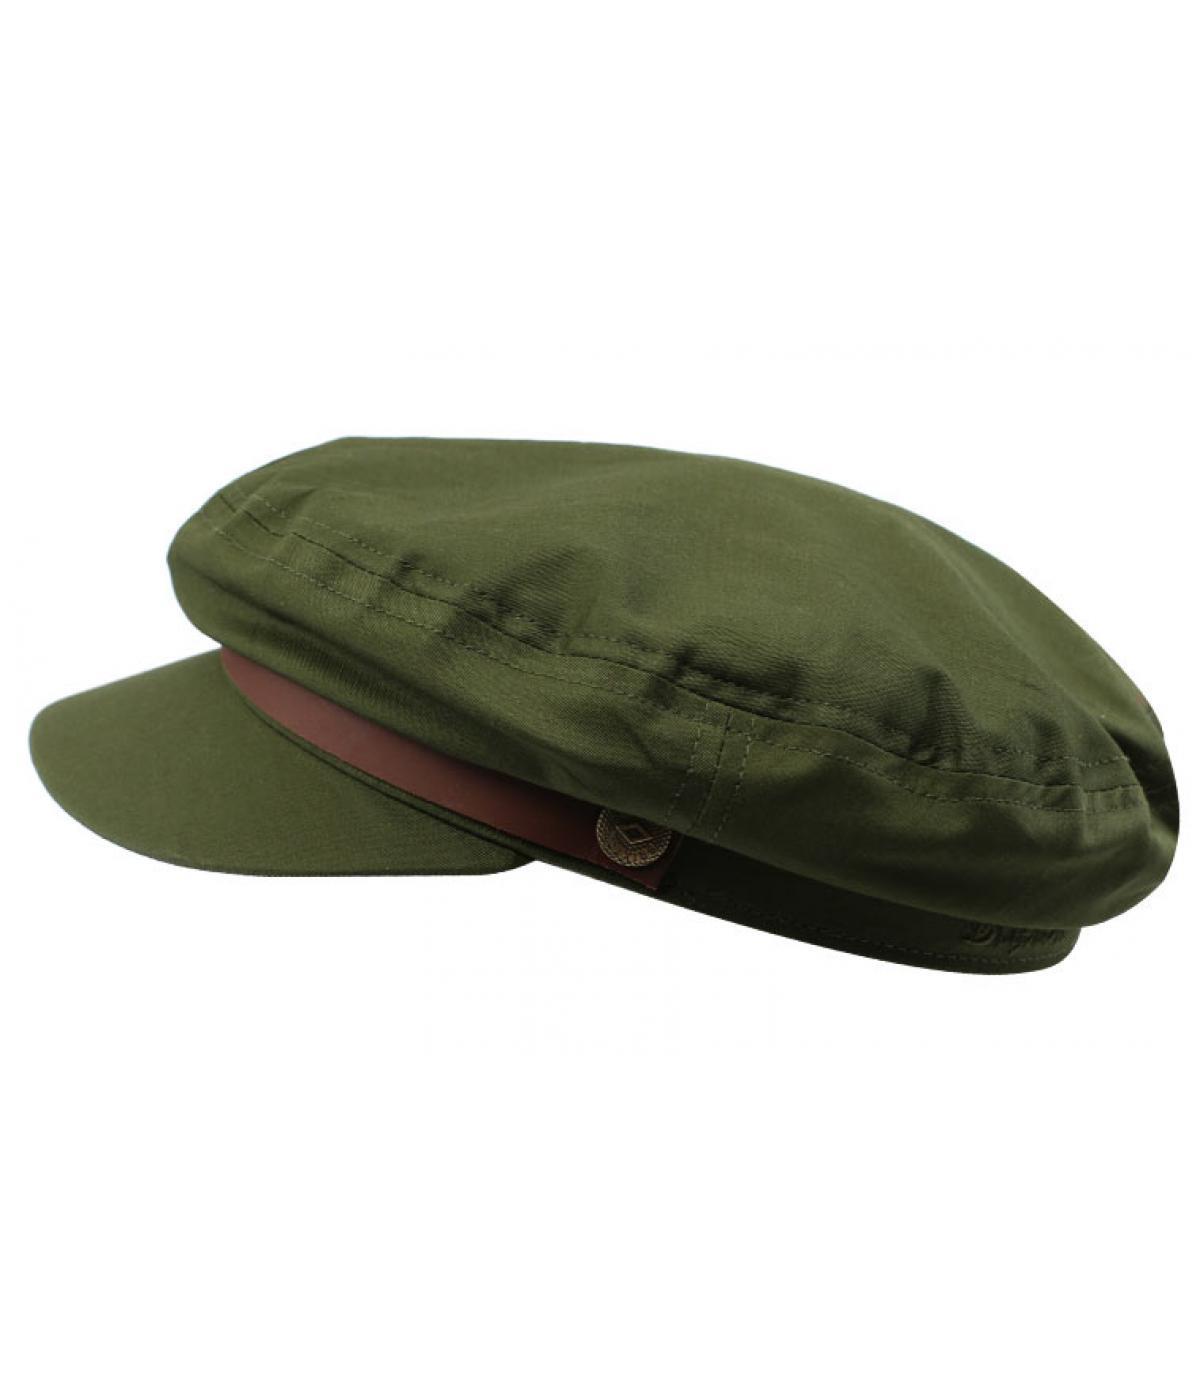 casquette marin femme olive